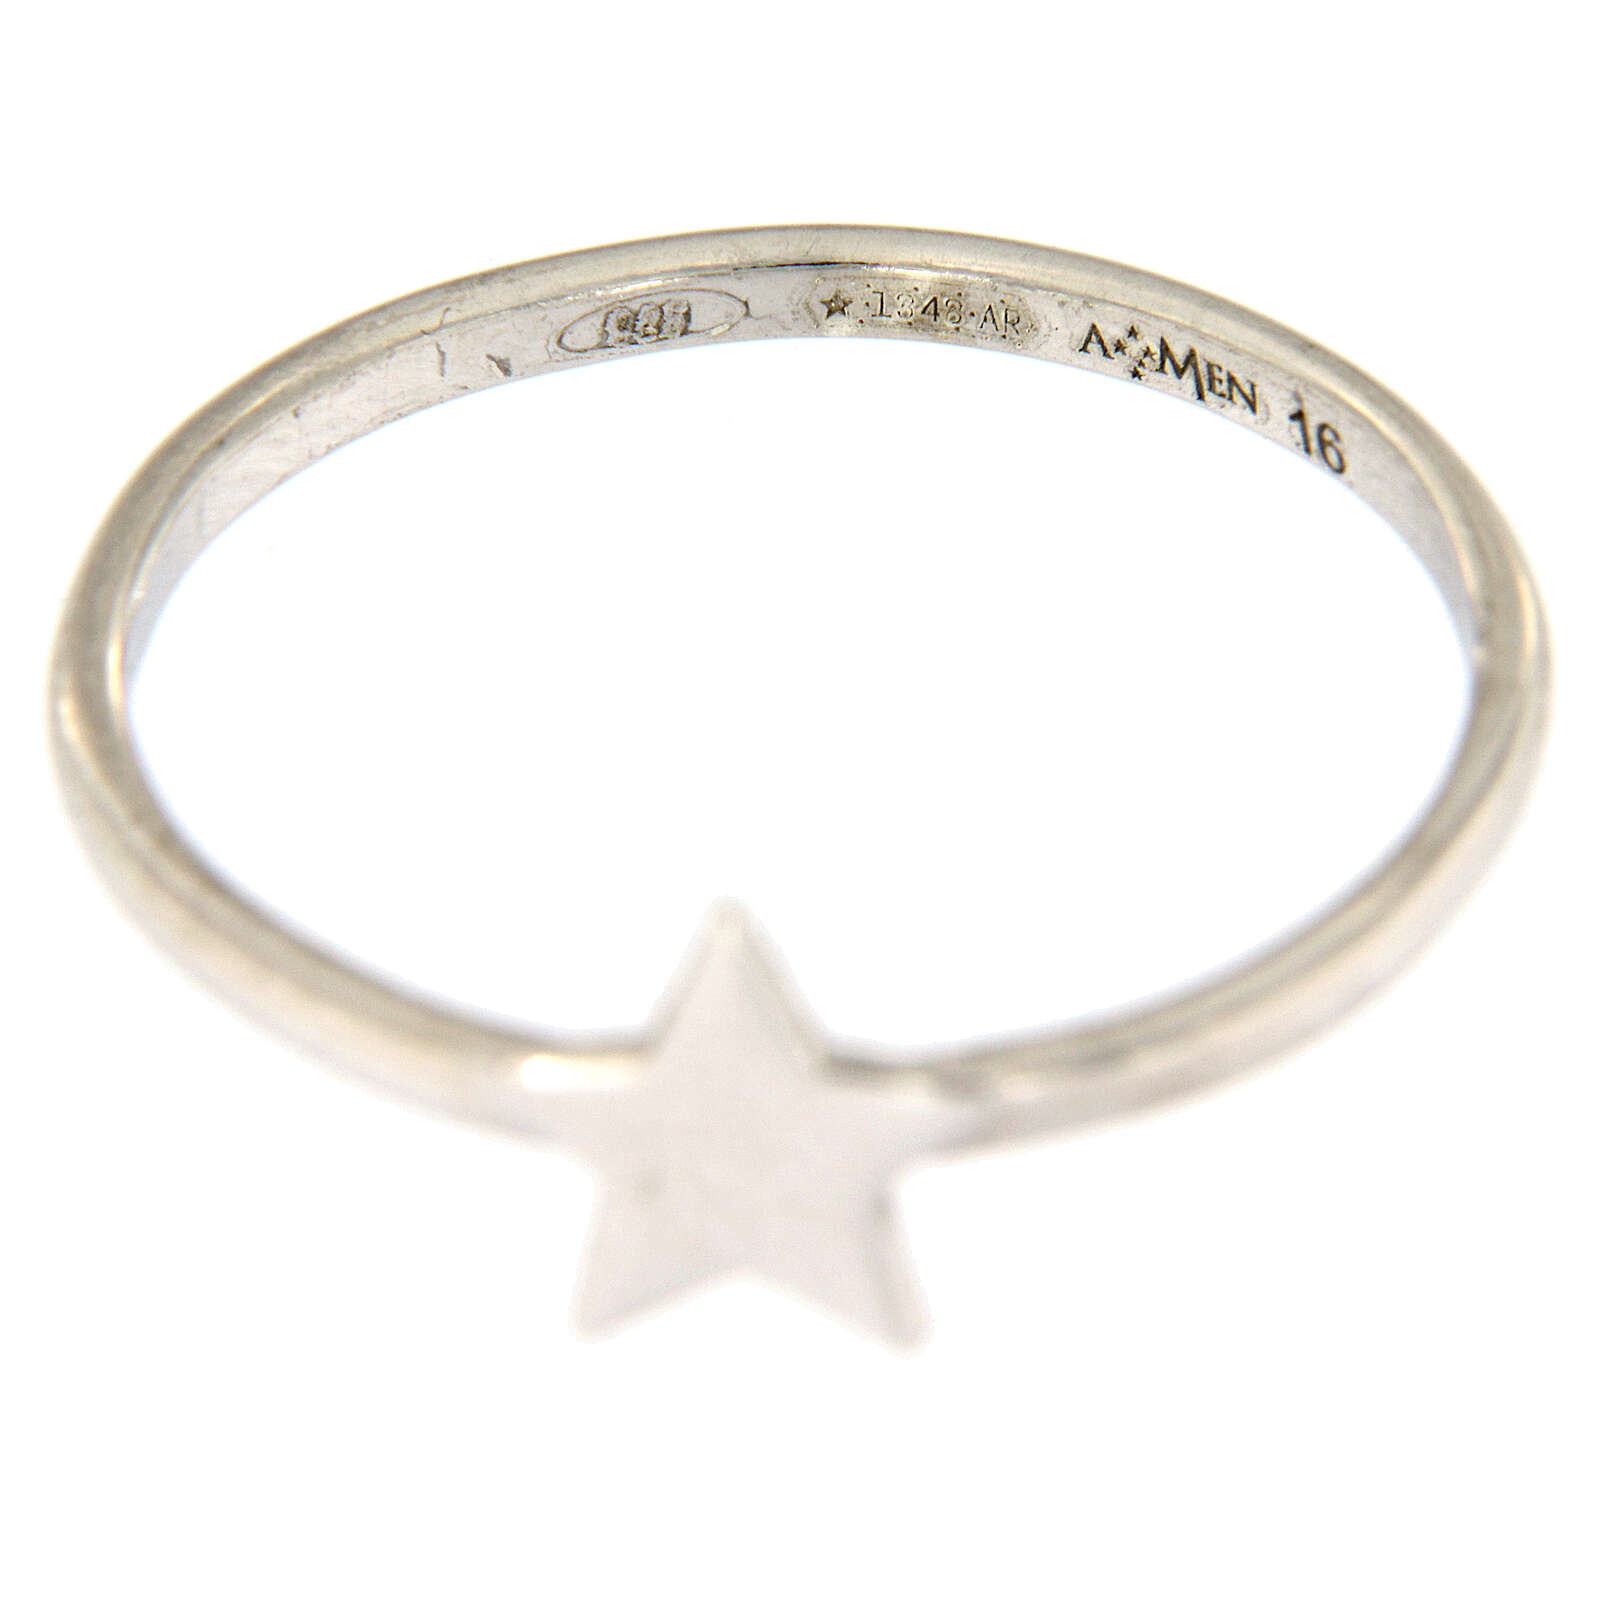 AMEN ring star 925 silver 3